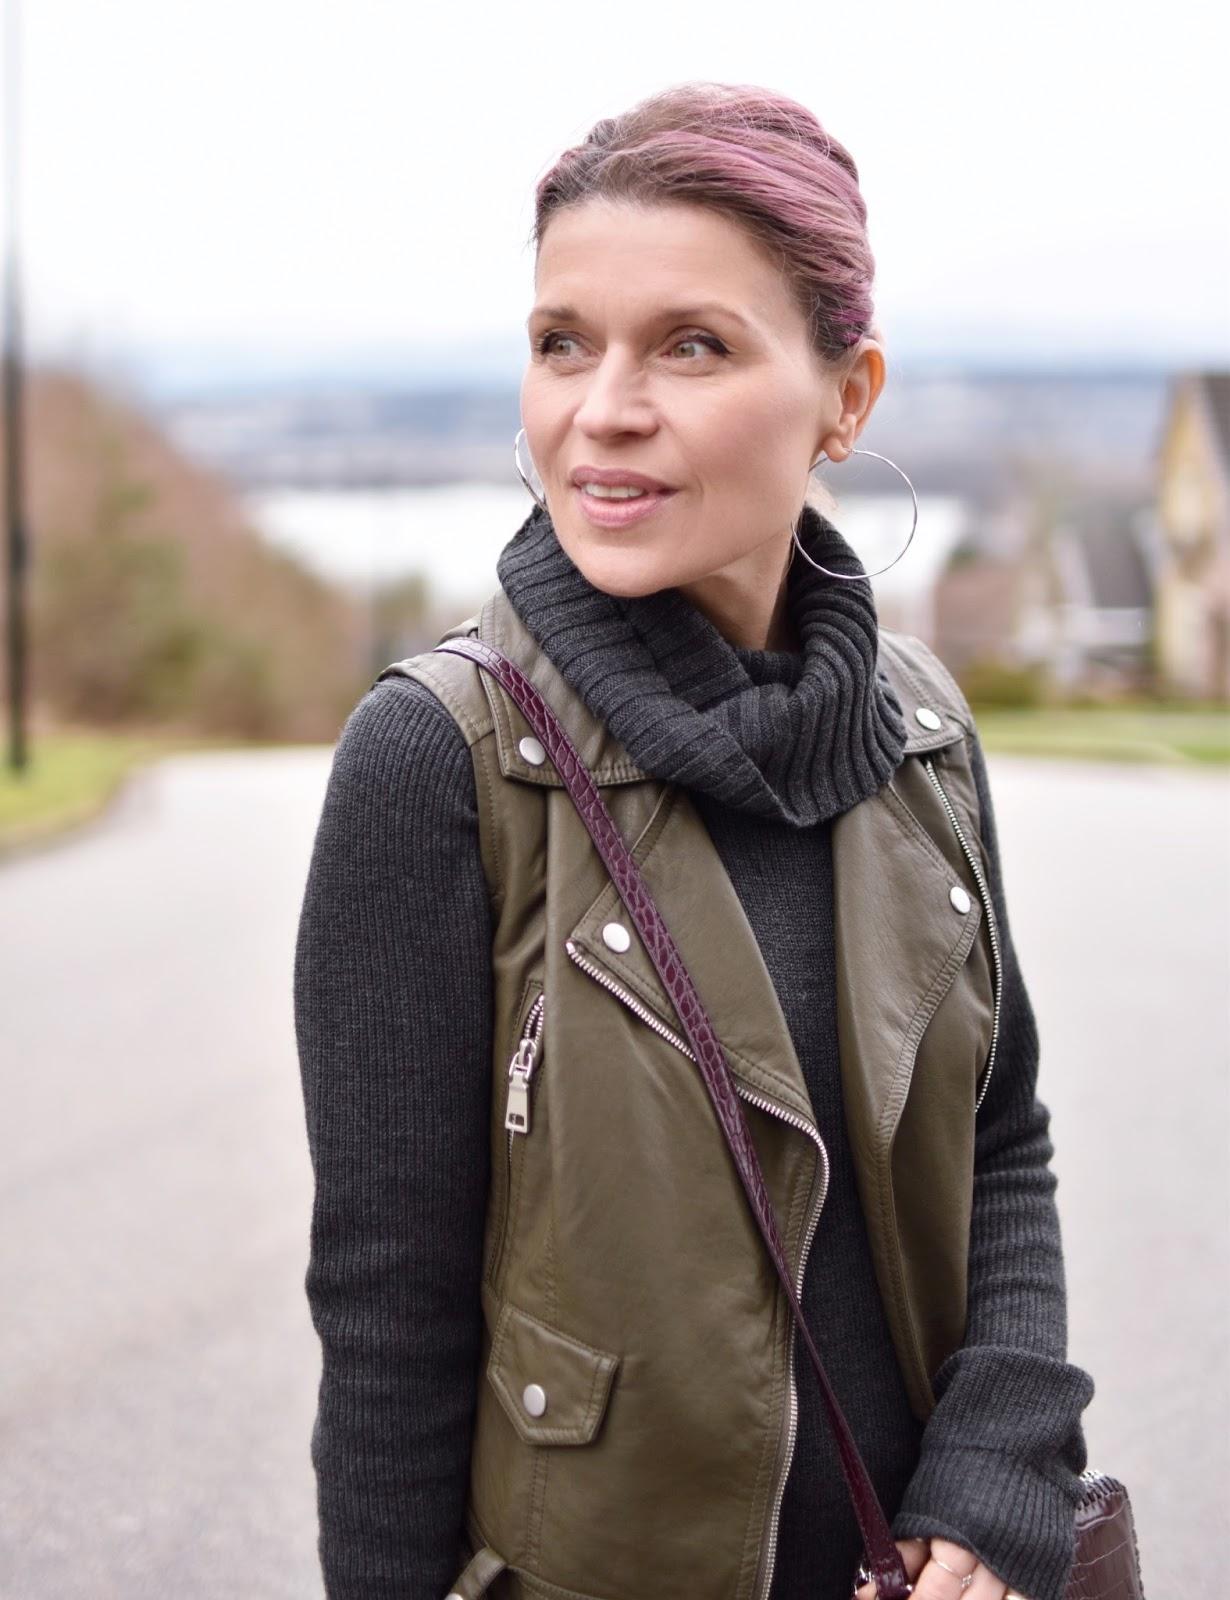 Monika Faulkner outfit inspiration - turtleneck sweater dress, motorcyle vest